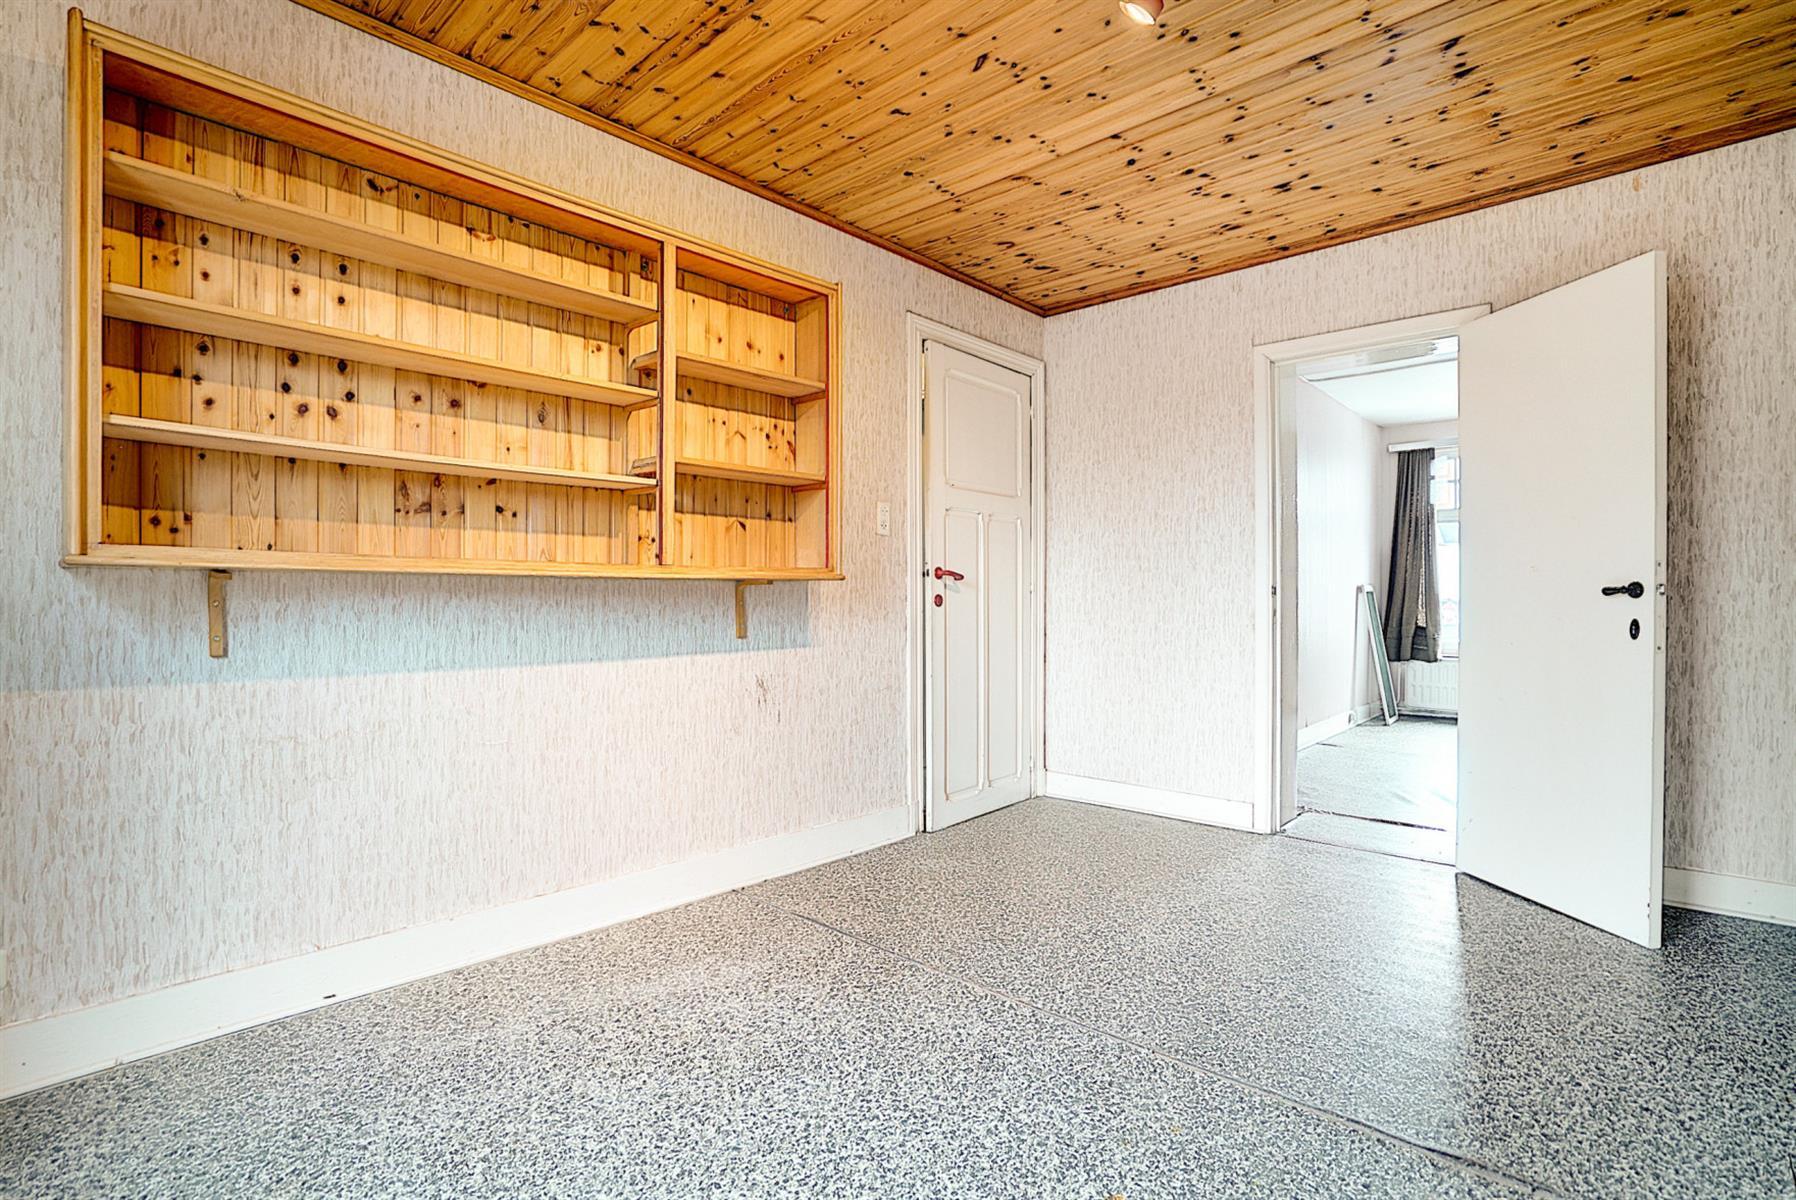 Maison - Ottignies-Louvain-la-Neuve - #4262981-17